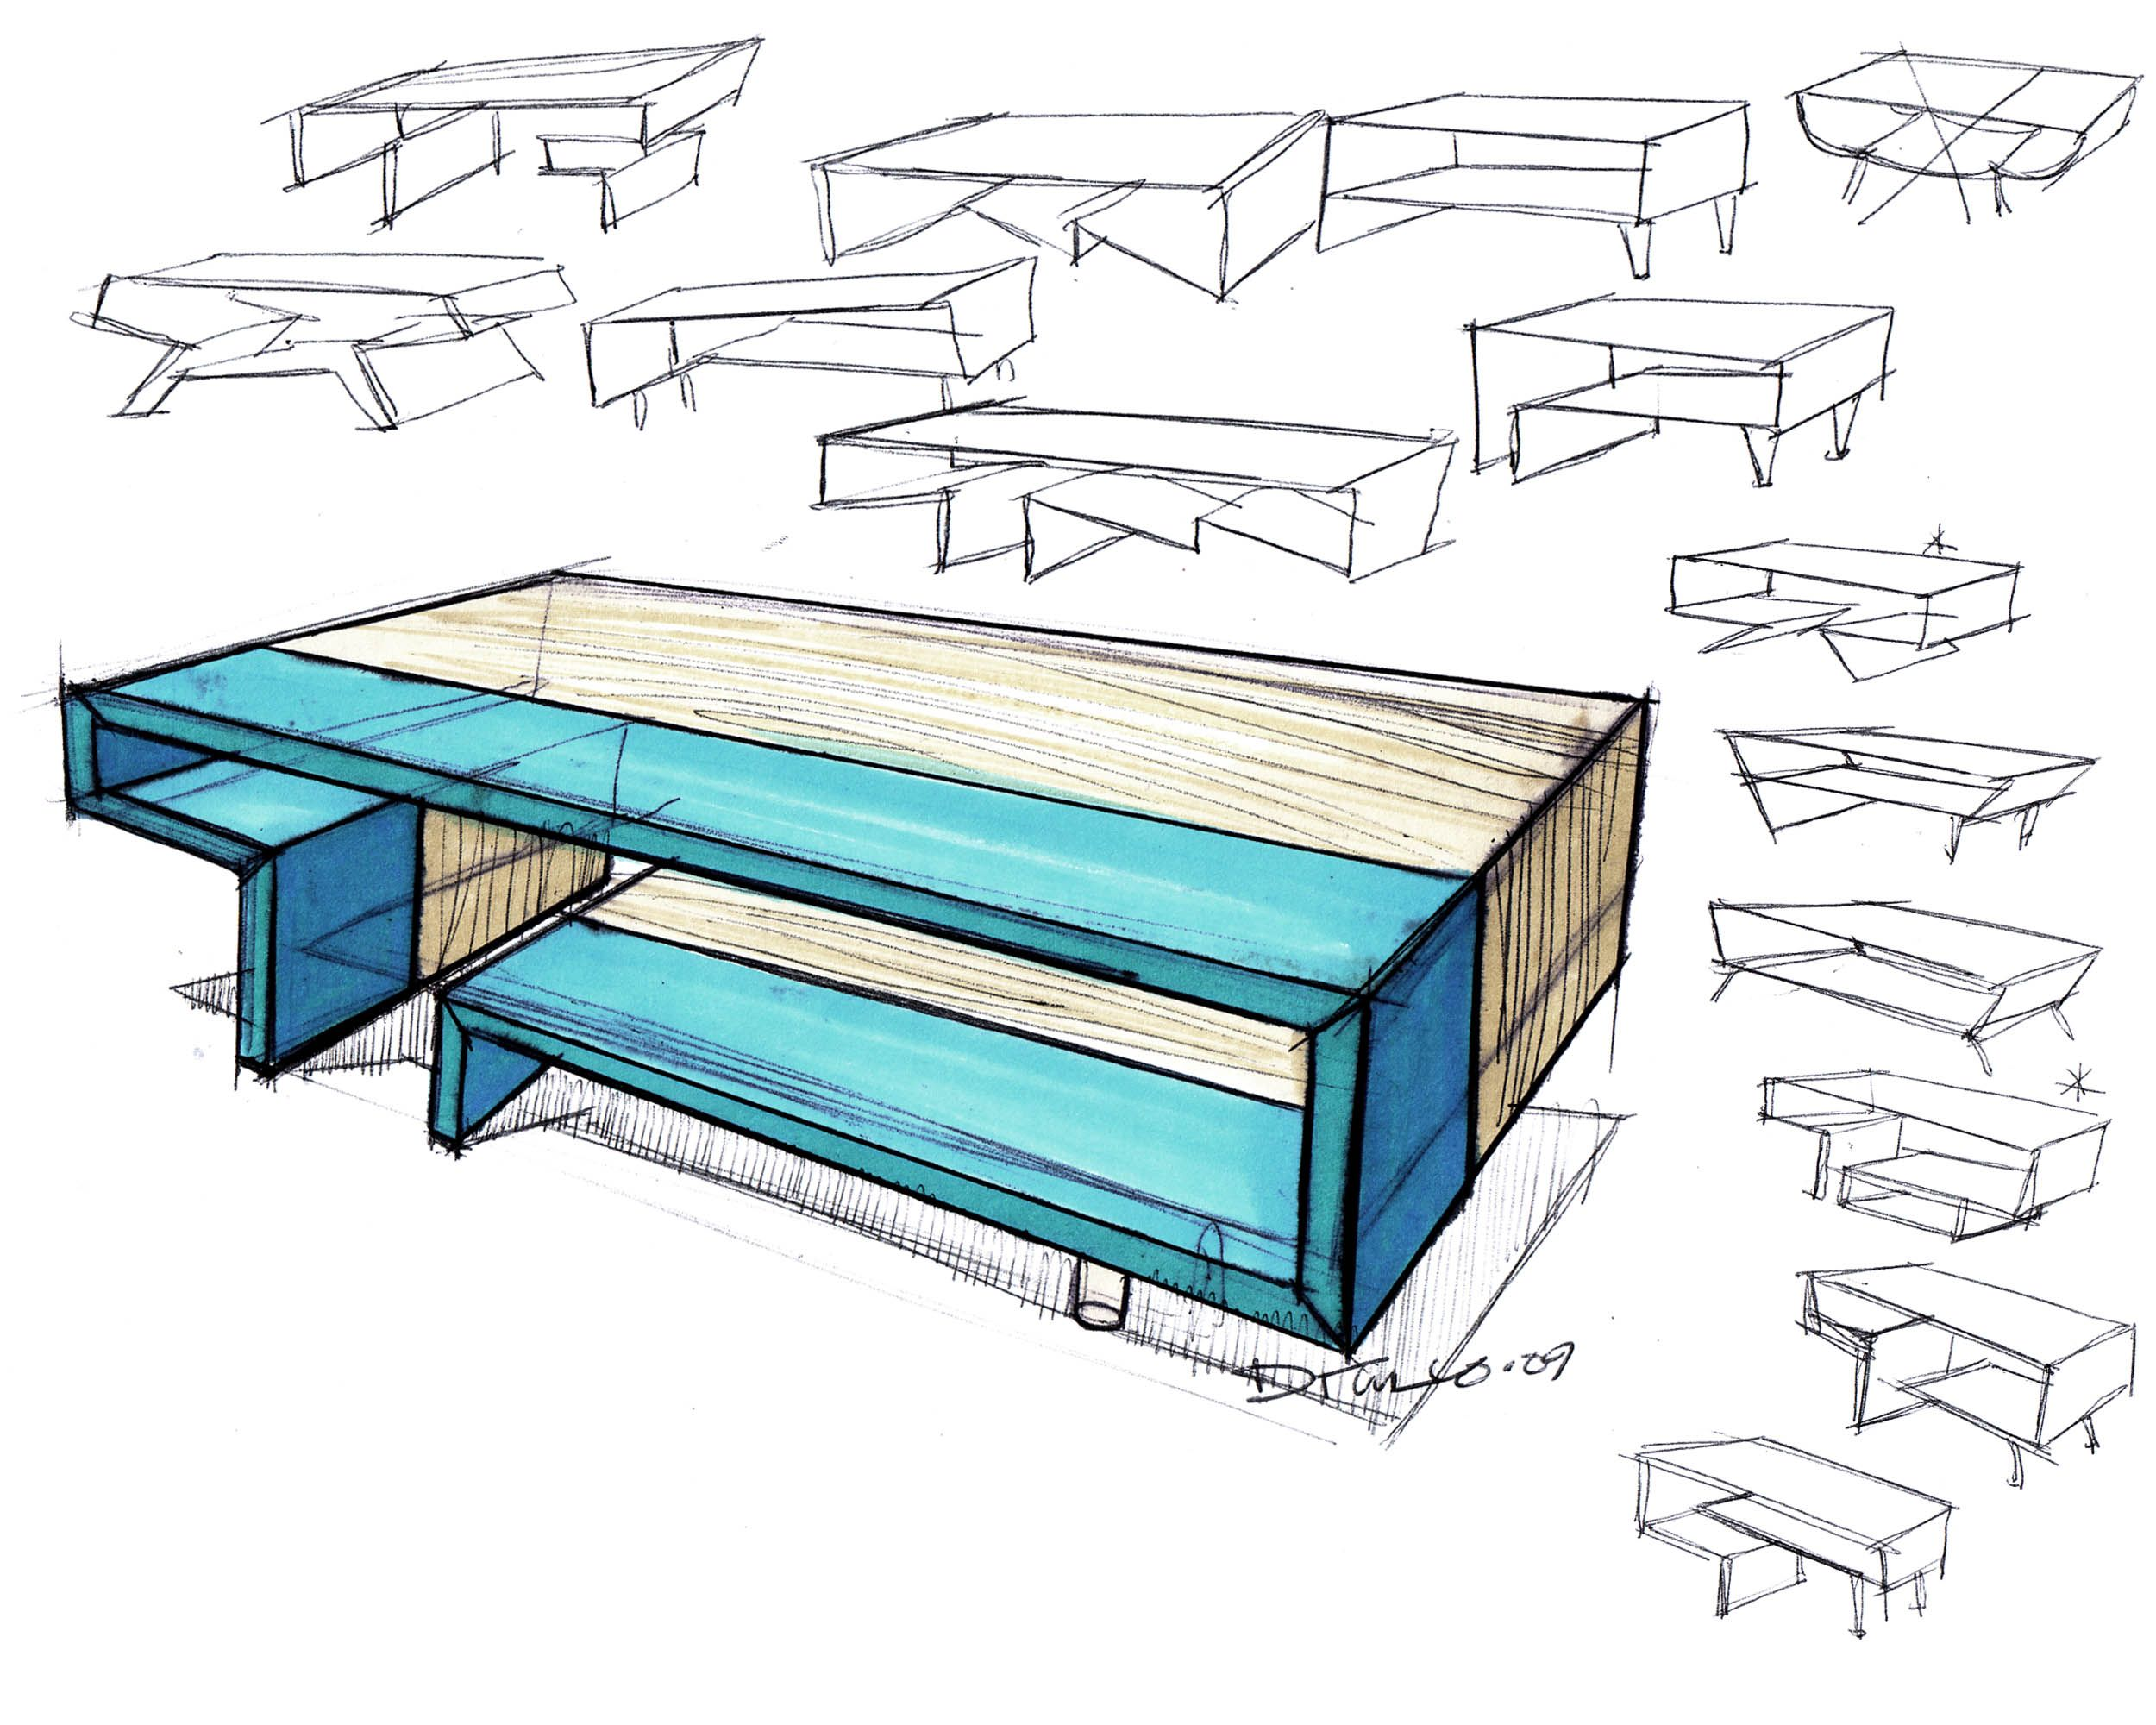 furniture by michael ditullo at coroflot com skecth table sketch rh pinterest com